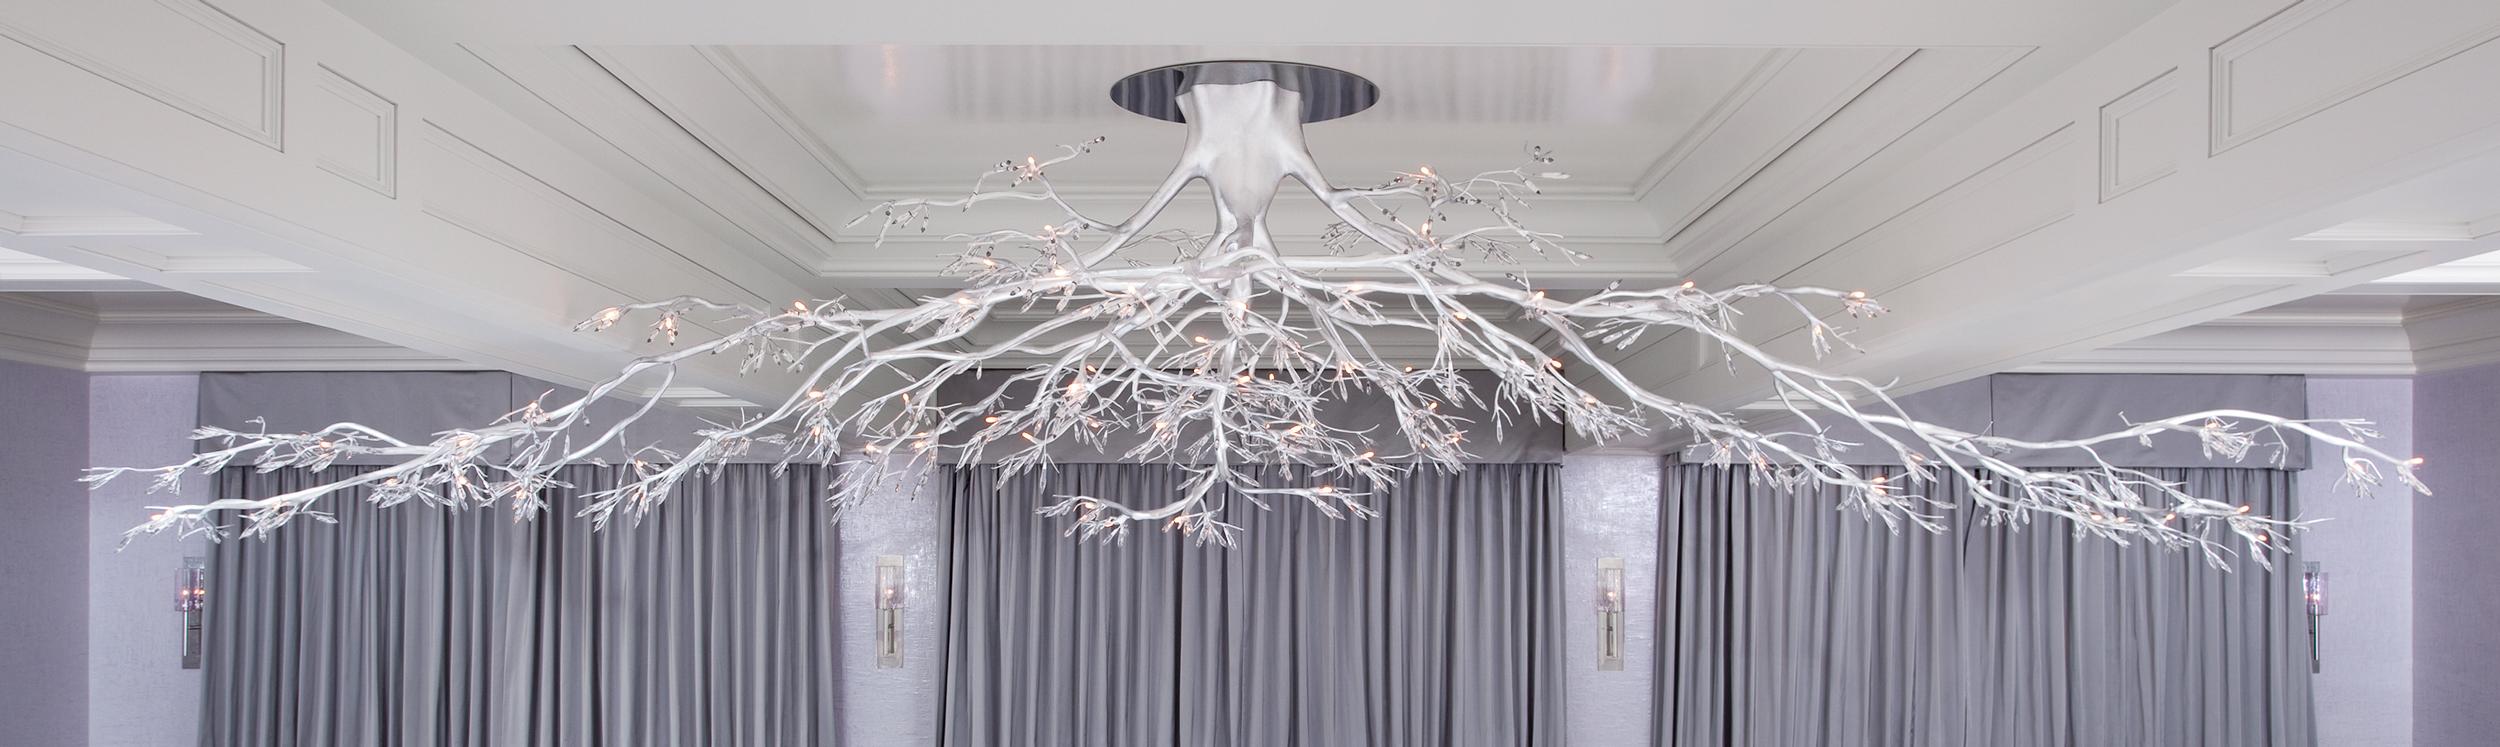 FAMILY-TREE-lighting-2-nicole-fuller-product-information